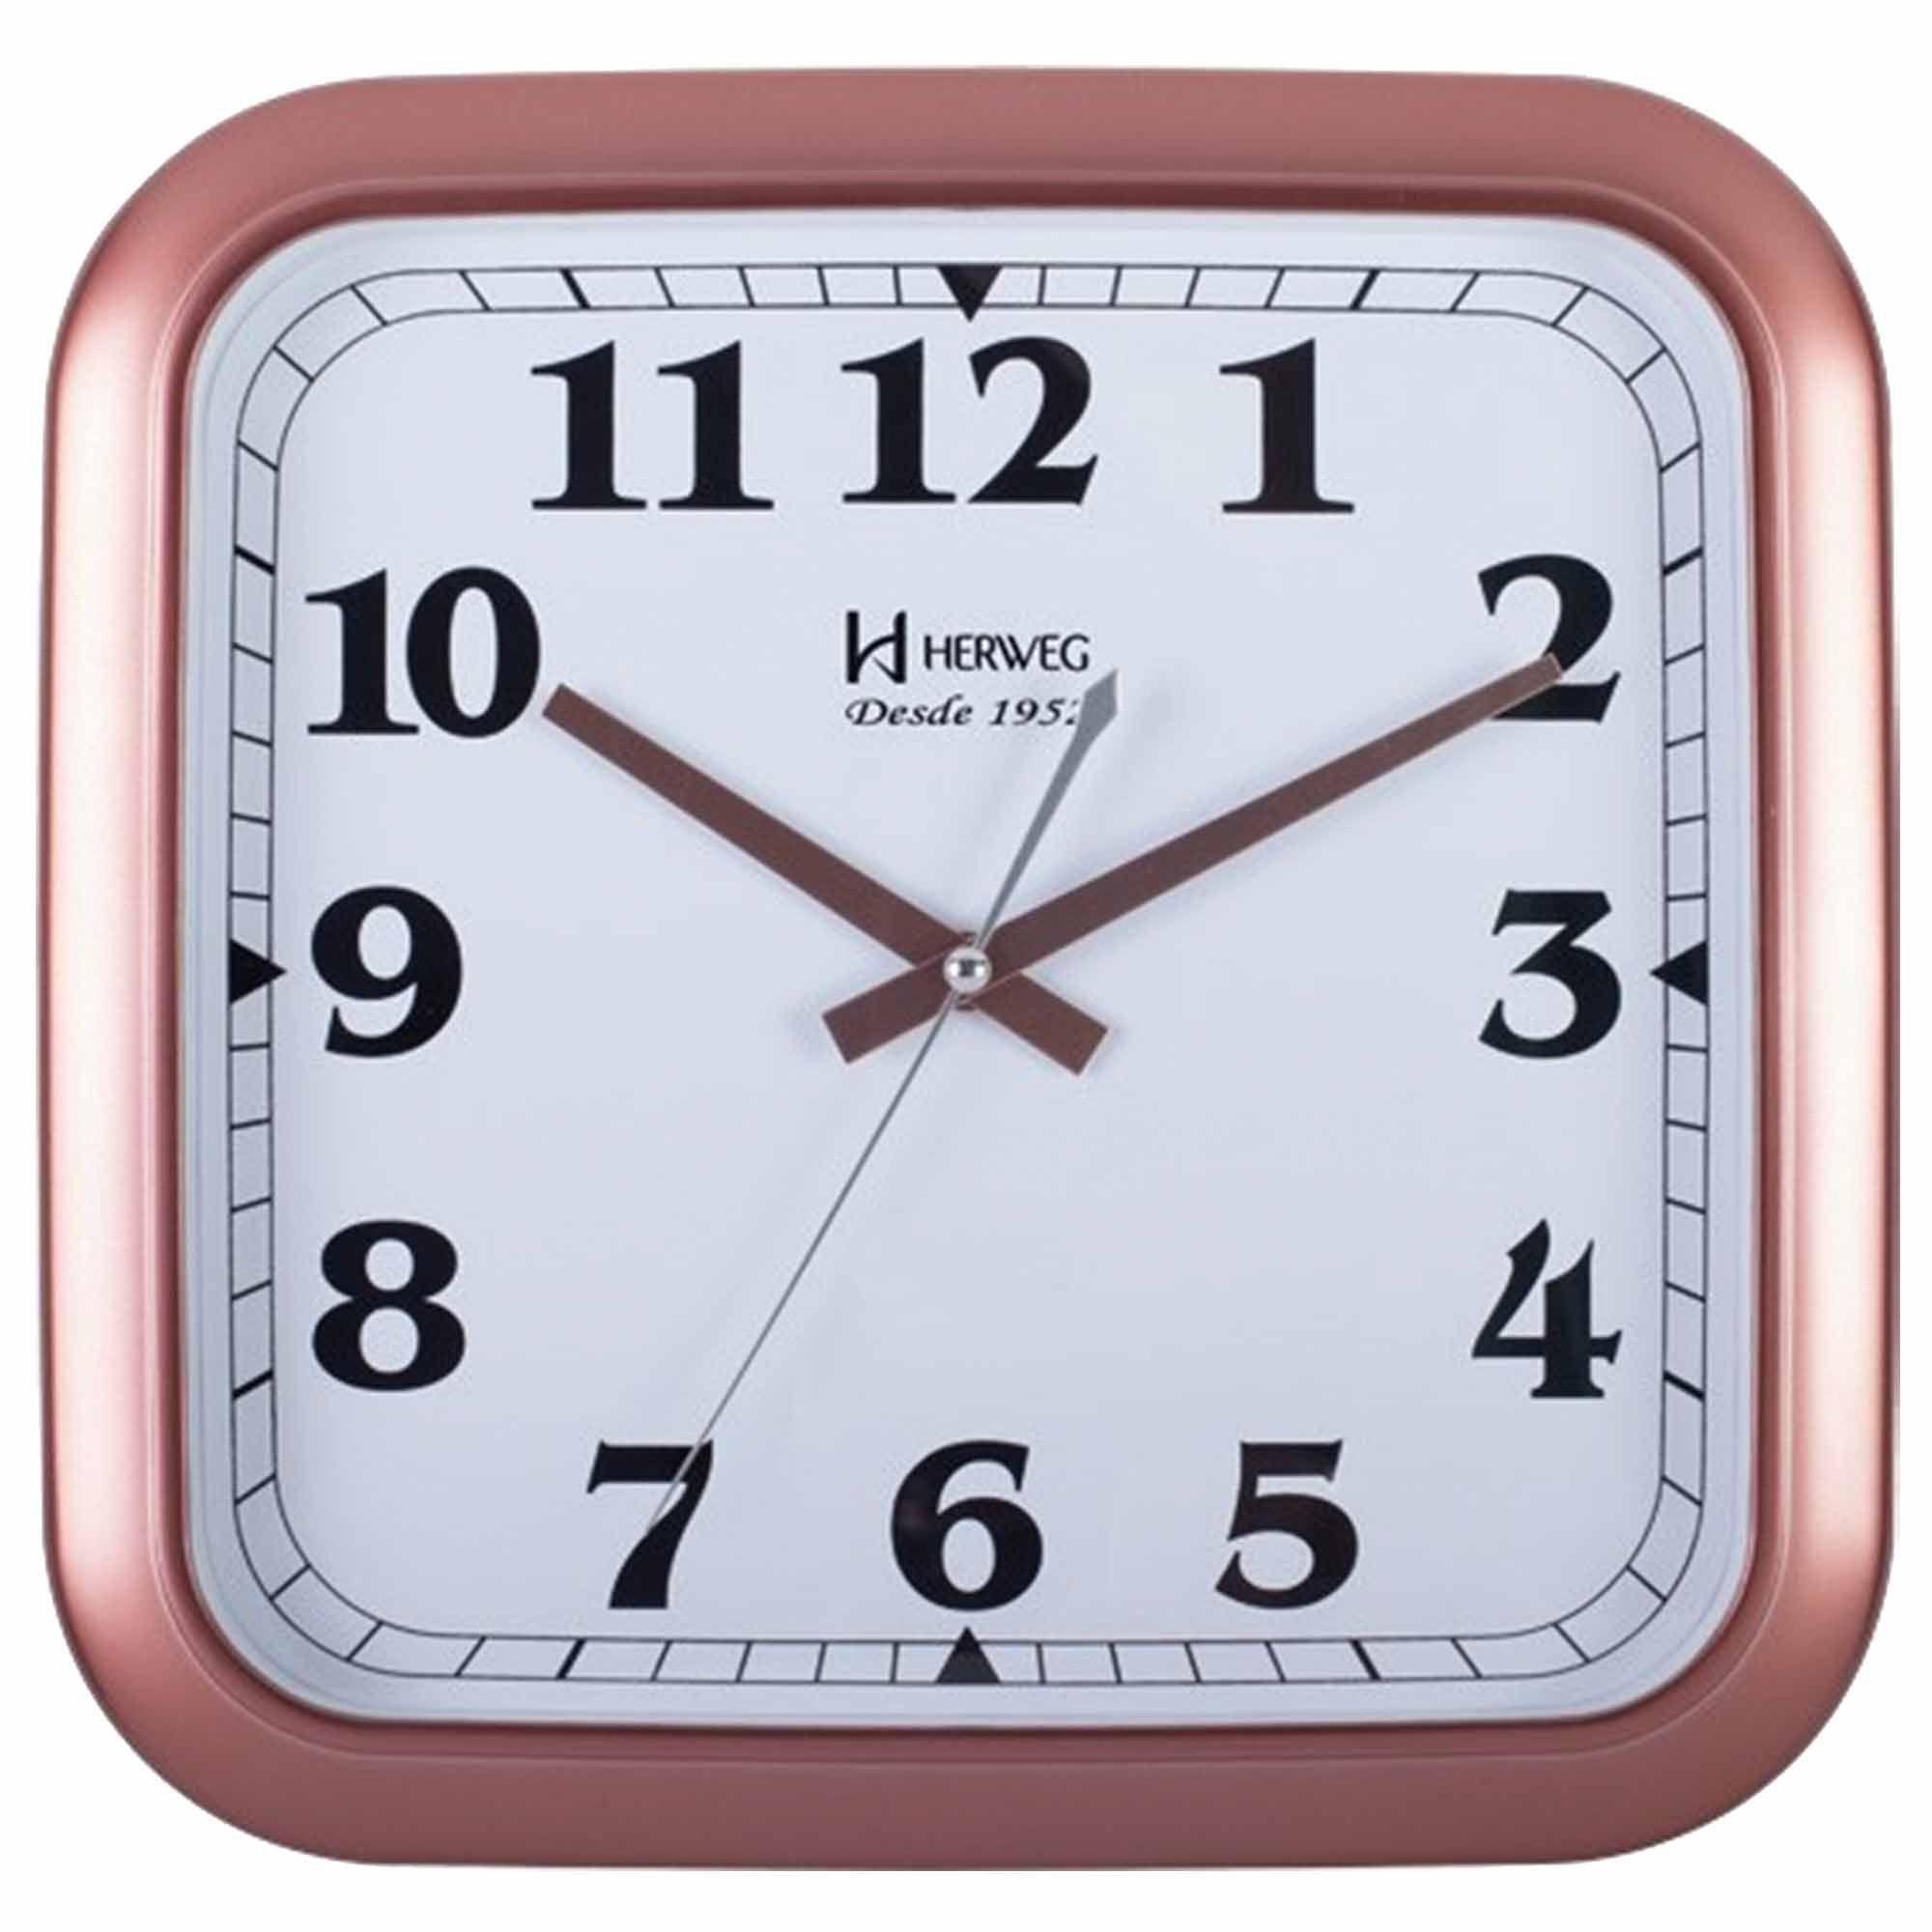 Relógio de Parede Analógico Herweg 6466 309 Rosê